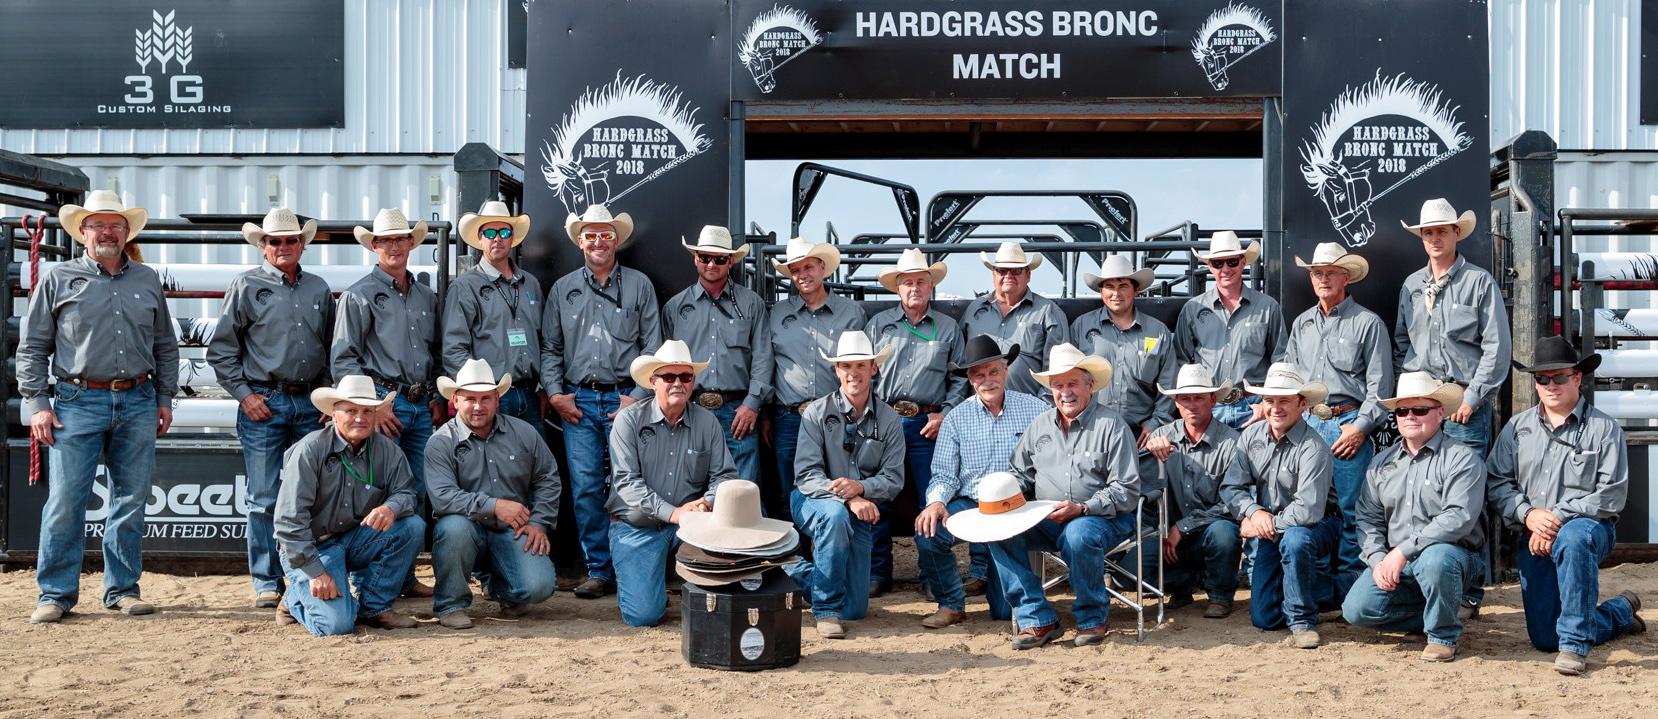 About the Hardgrass Bronc Match team